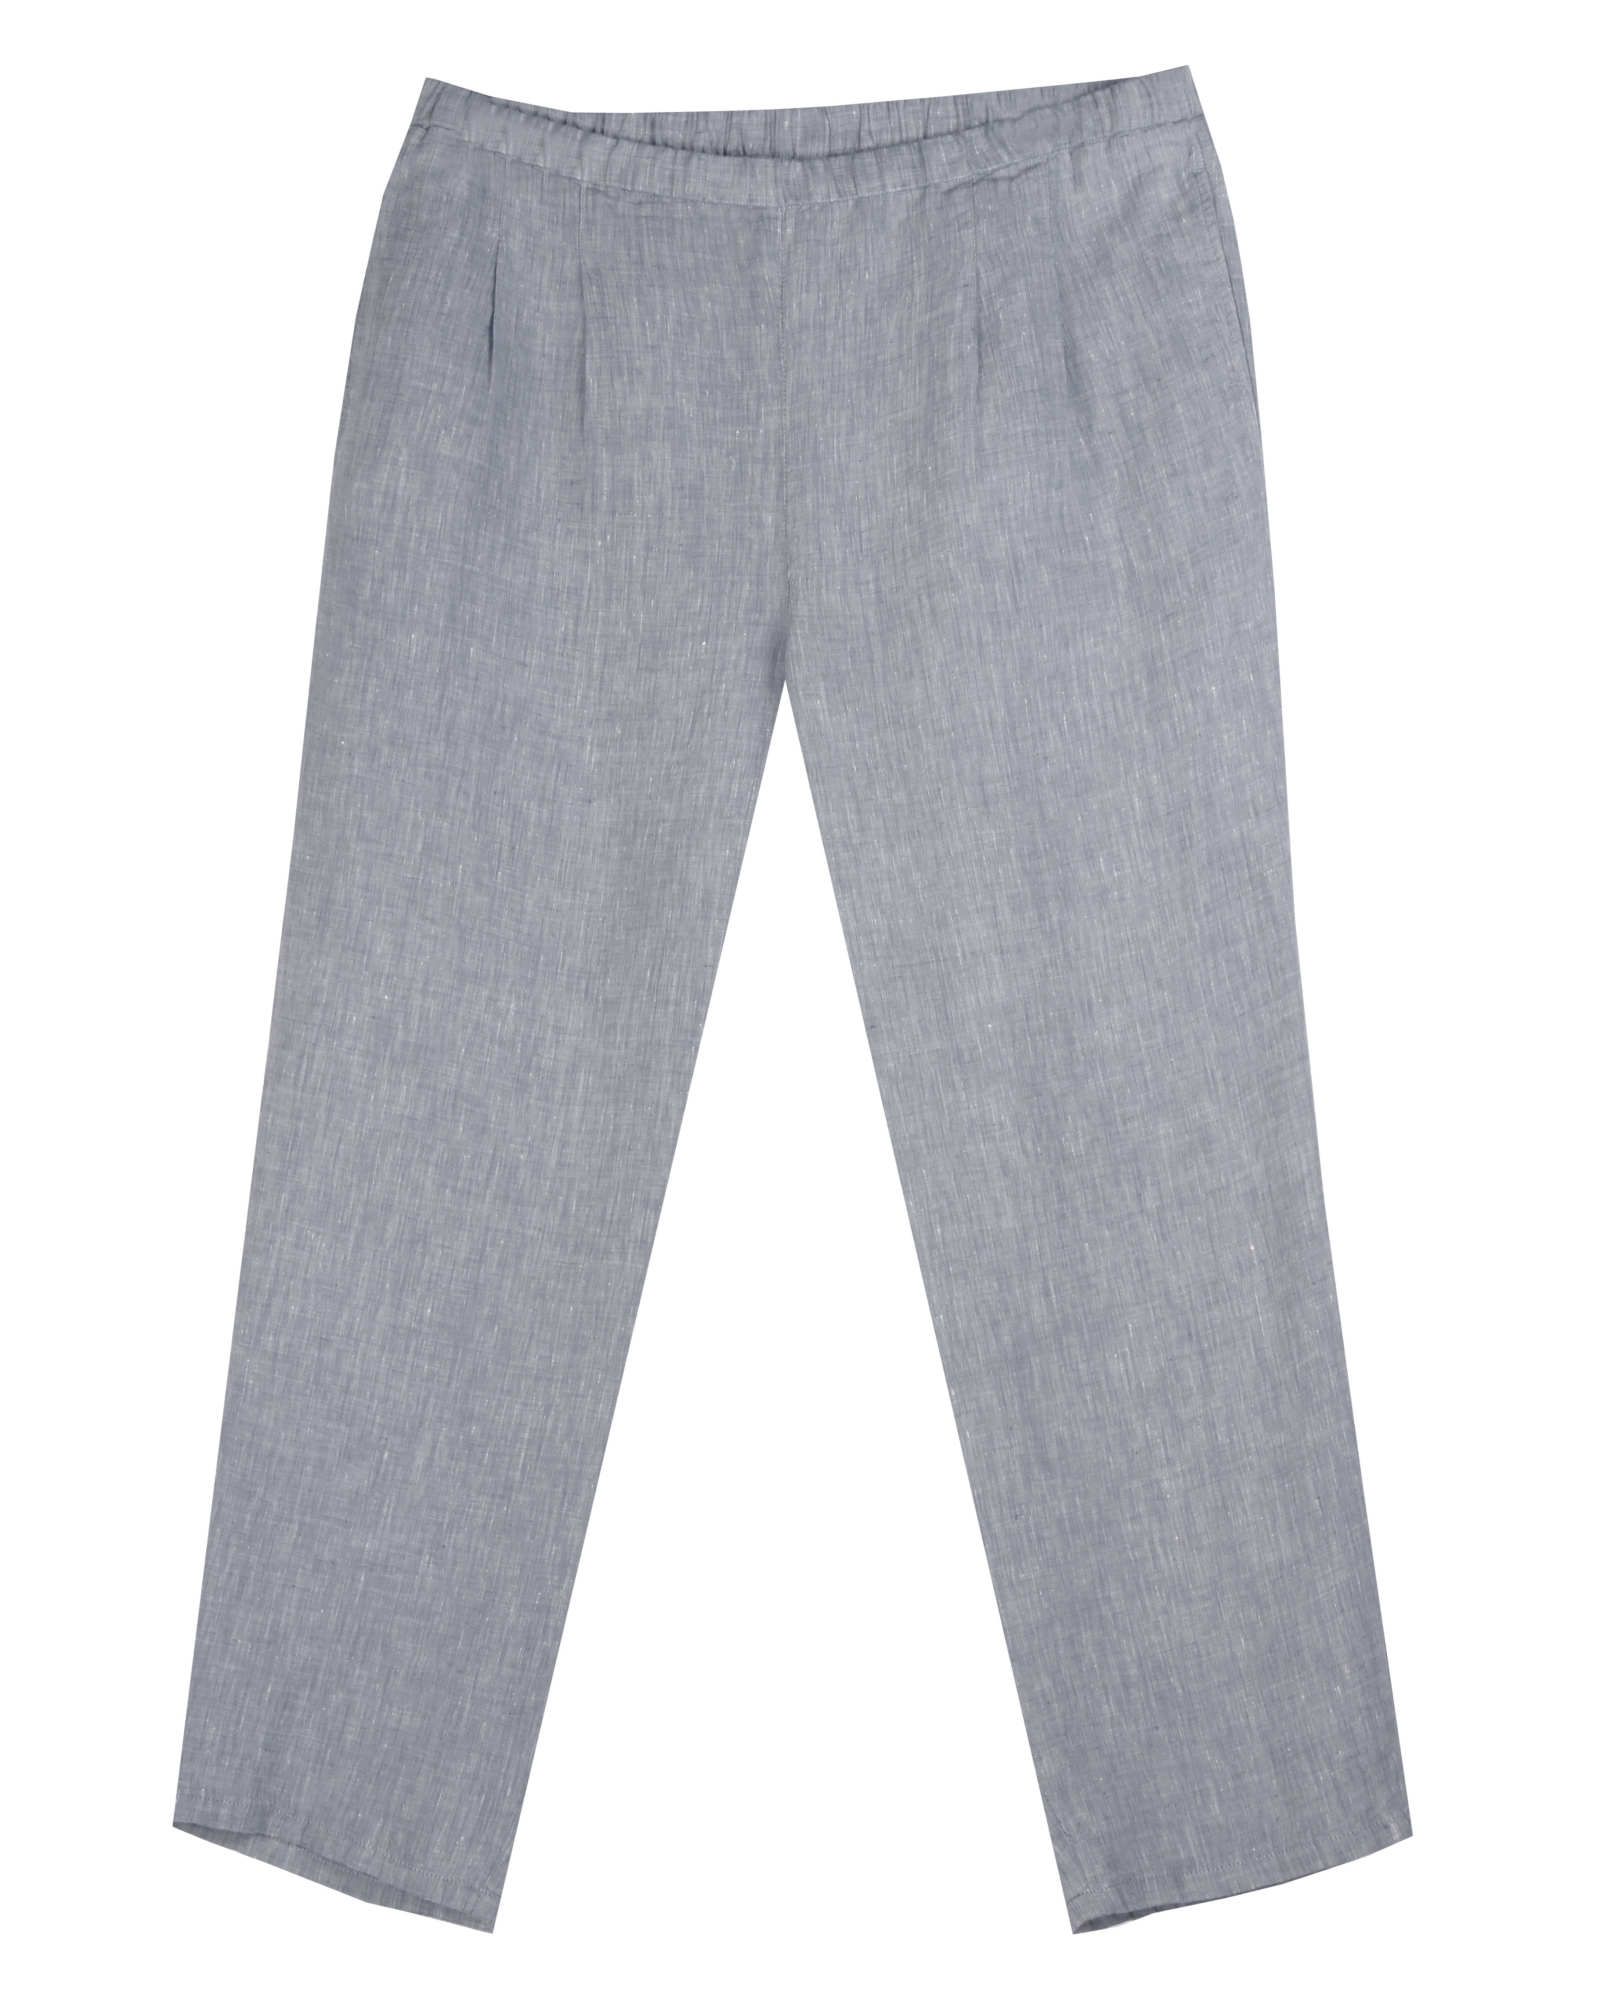 Cozy Tweed Rib Pant